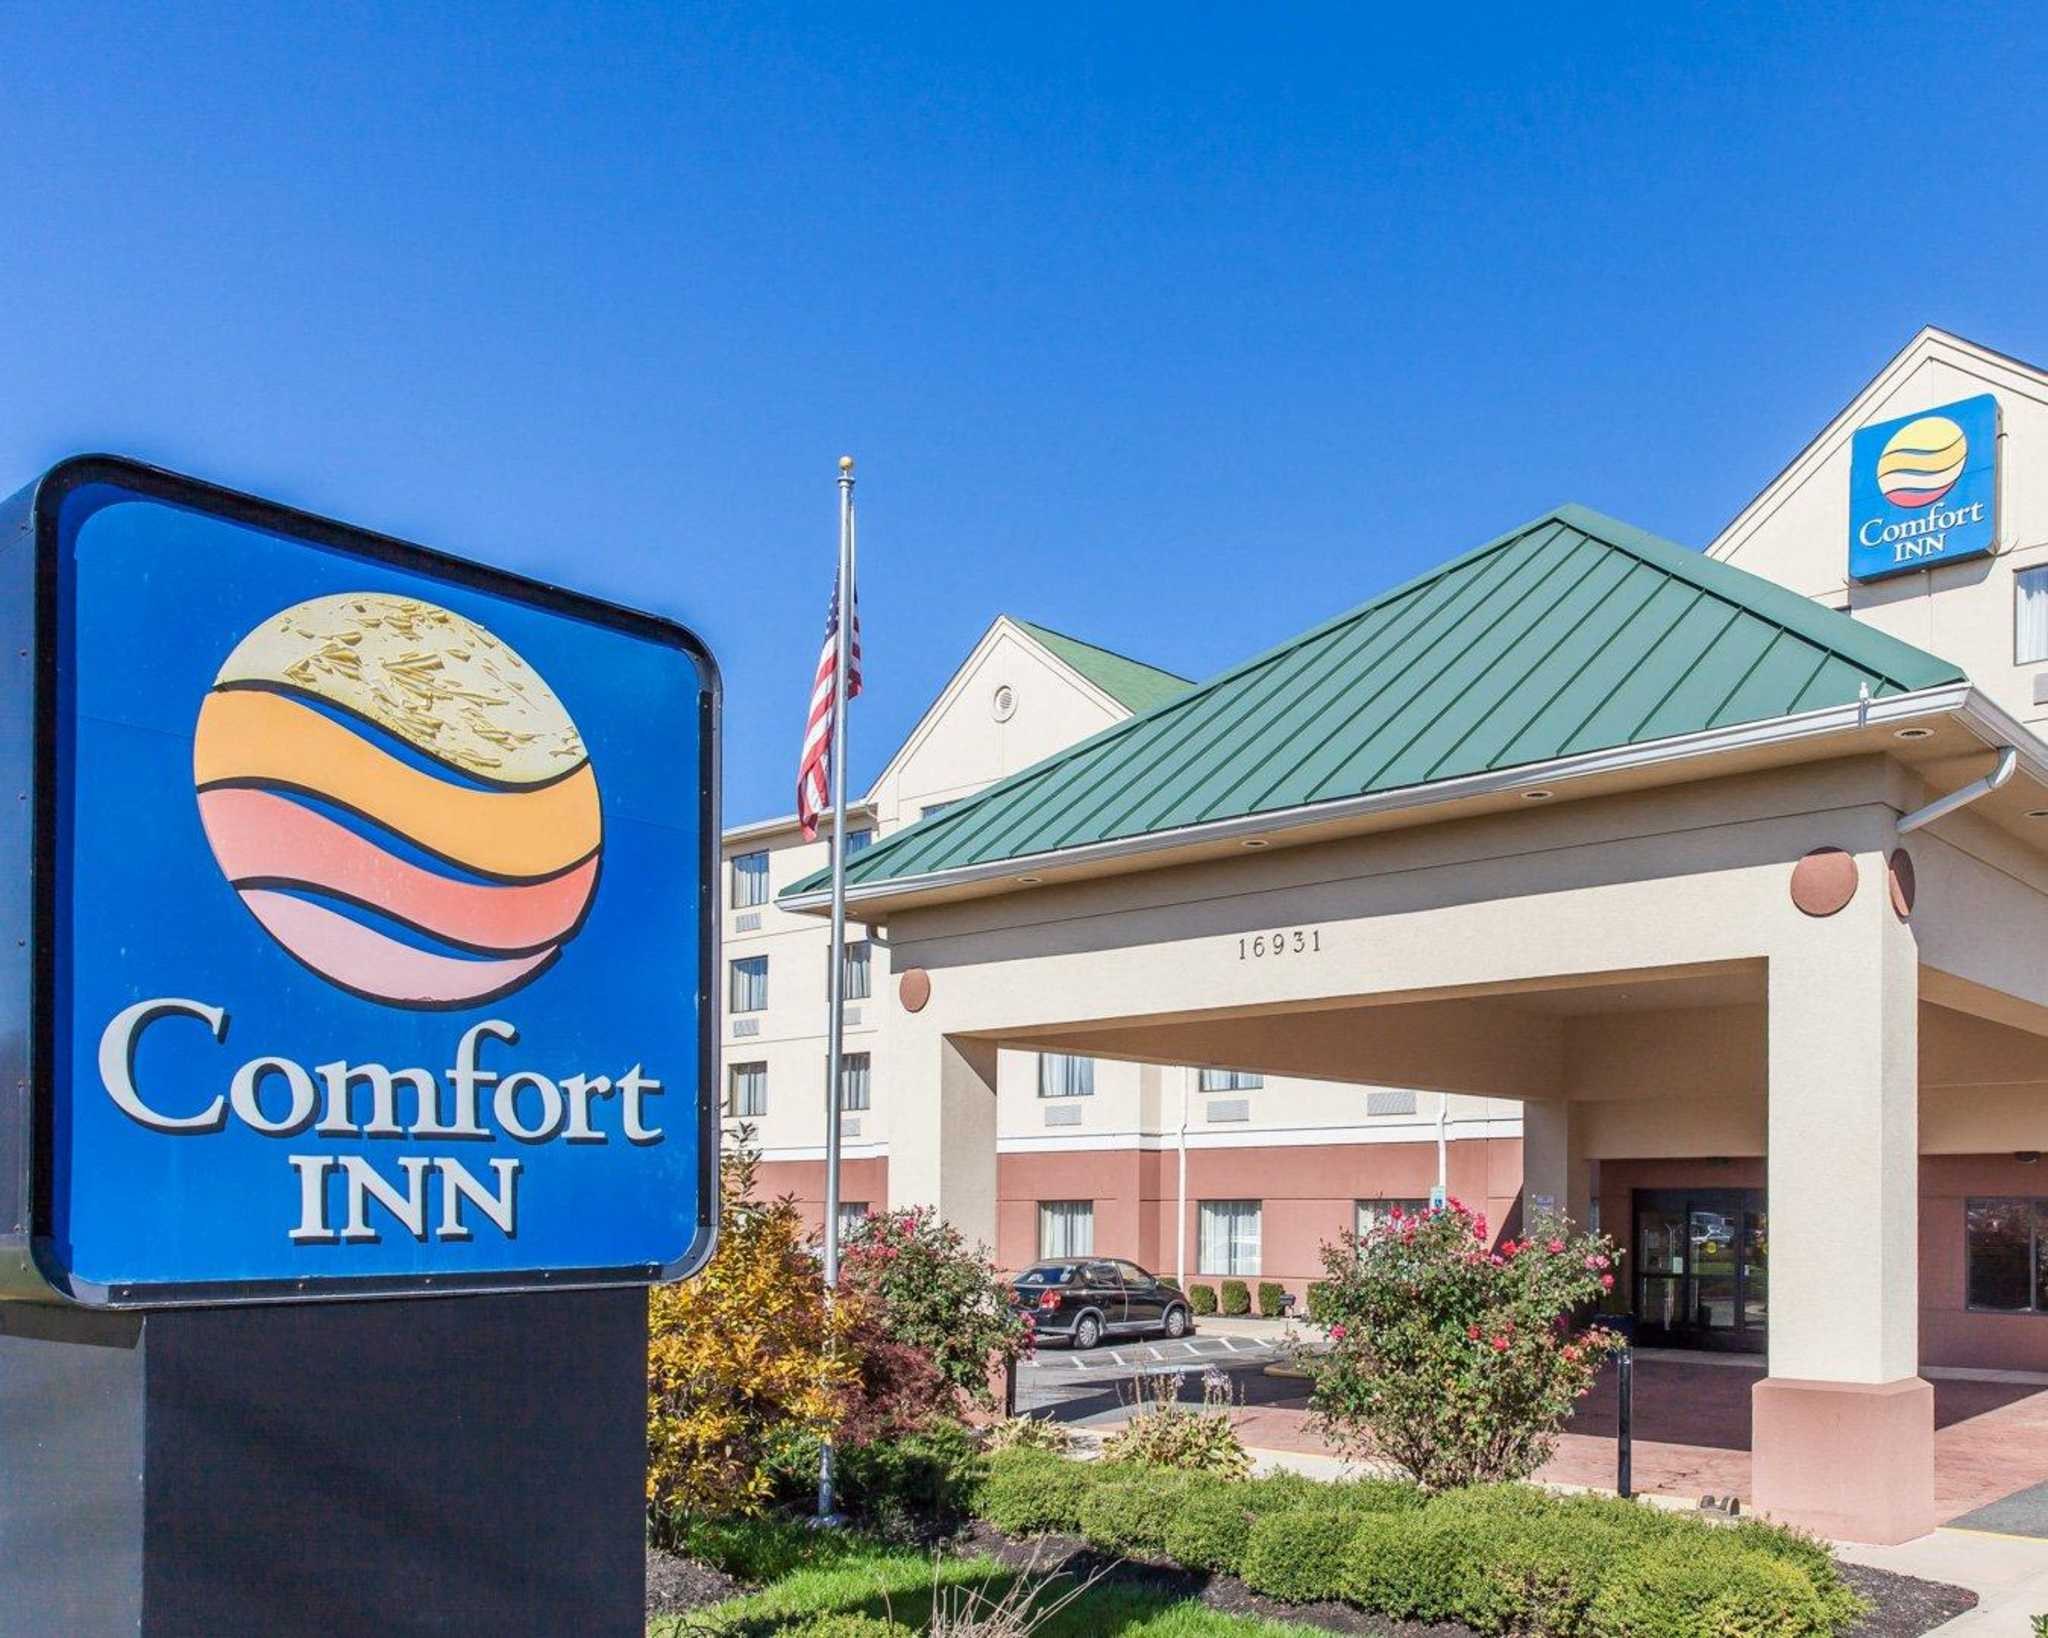 Comfort Inn Near Quantico Main Gate North Dumfries Va